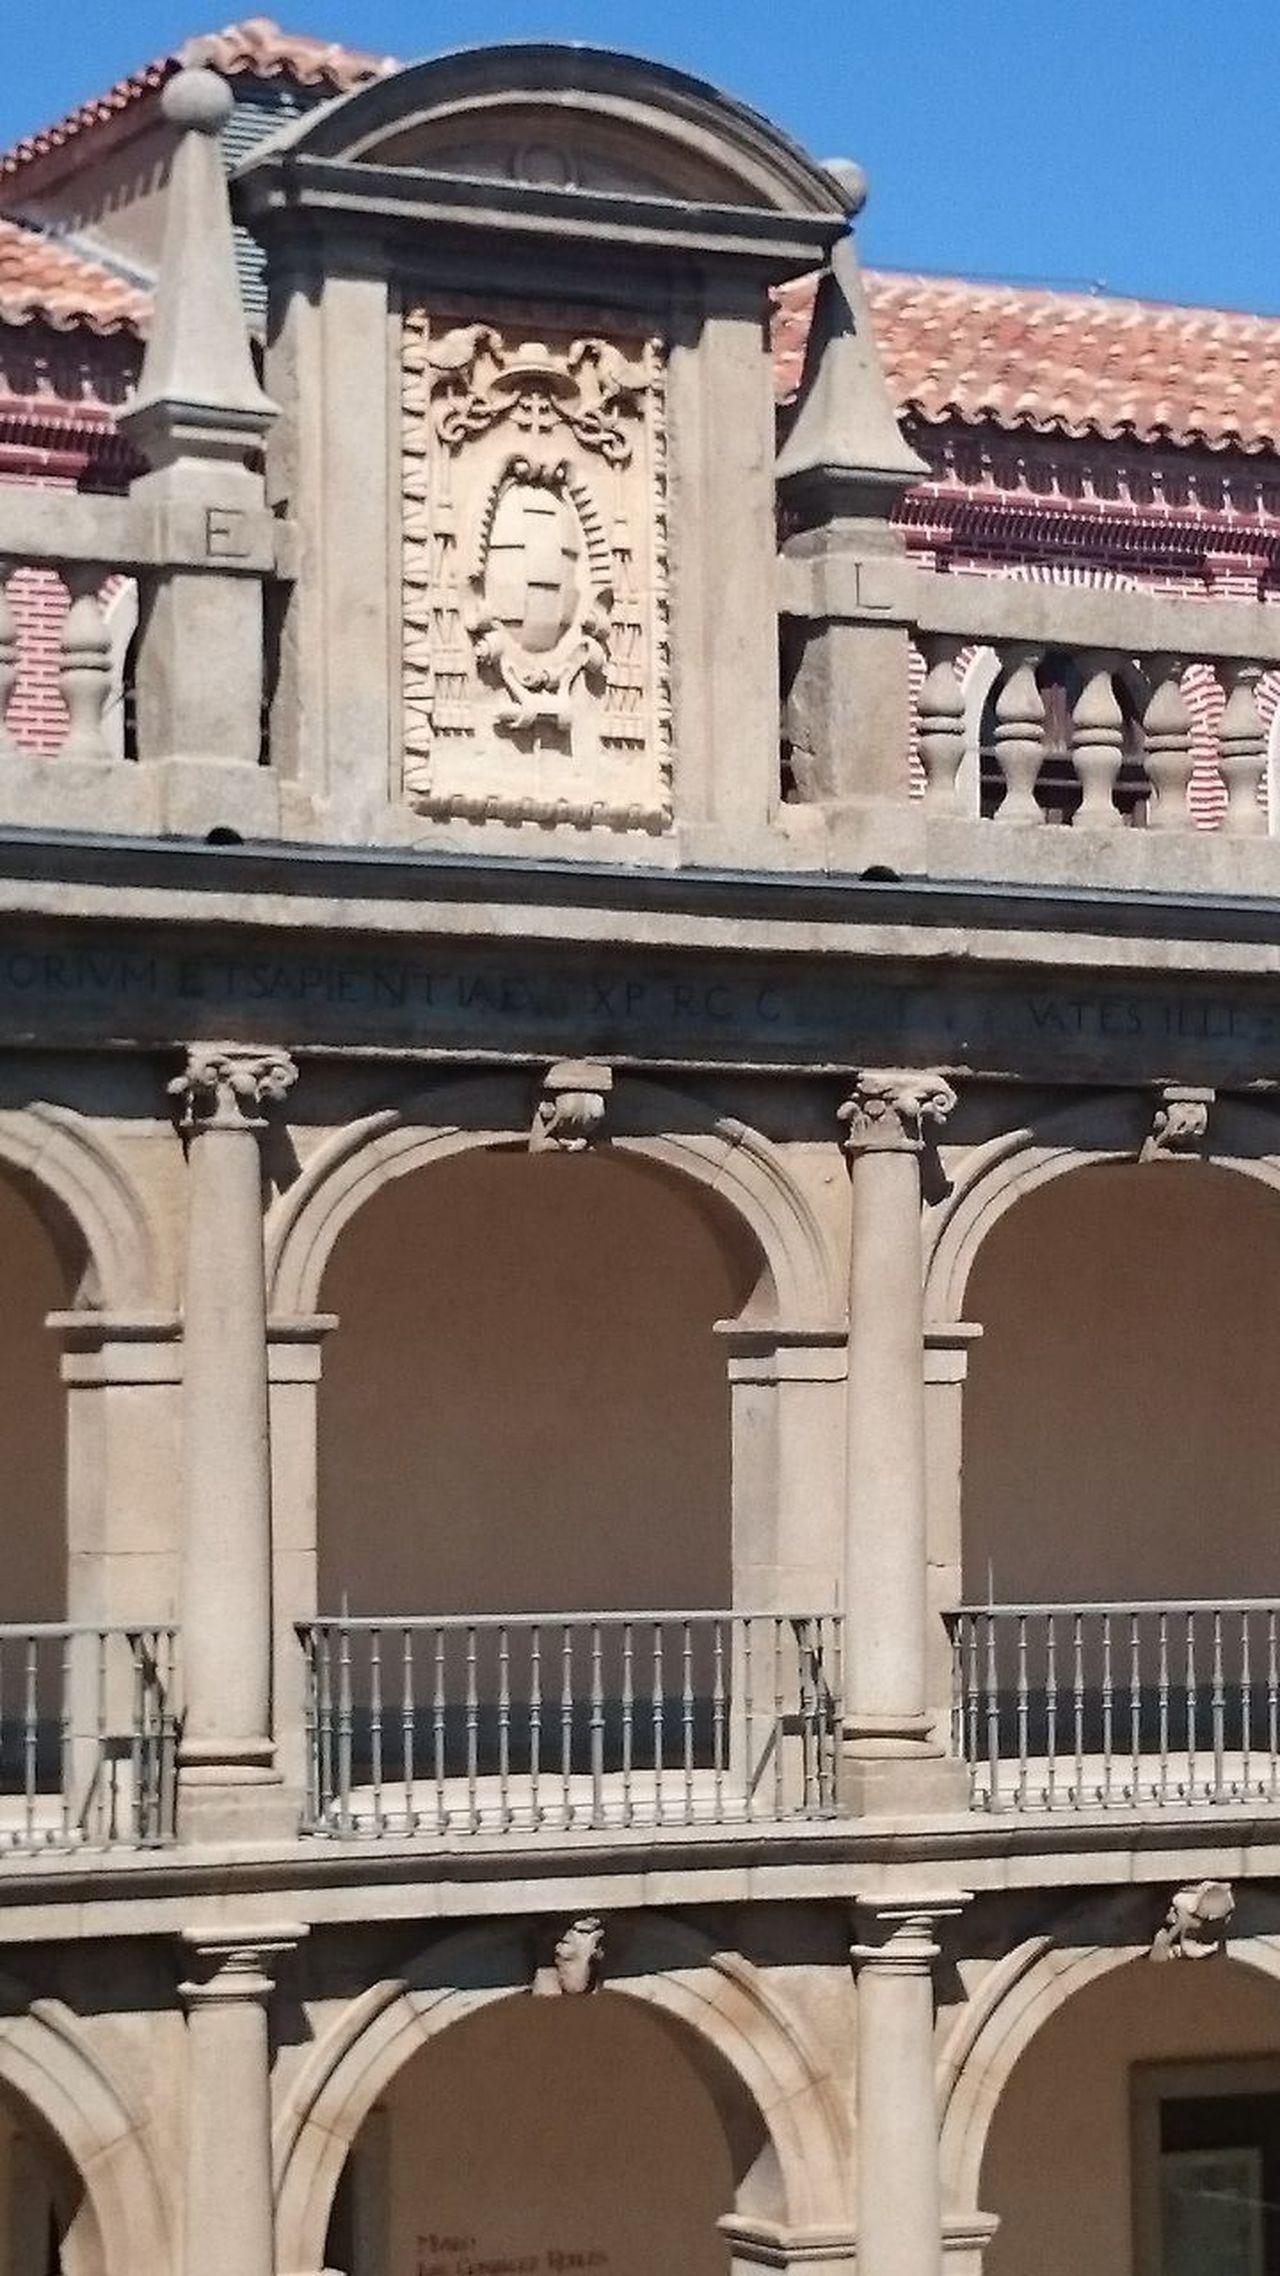 Universidad De Alcala De Henares. Université De Alcalá De Henares Universidad University Universität  Università  Historical Building Historia Studying Historic City Historic Building Showcase March